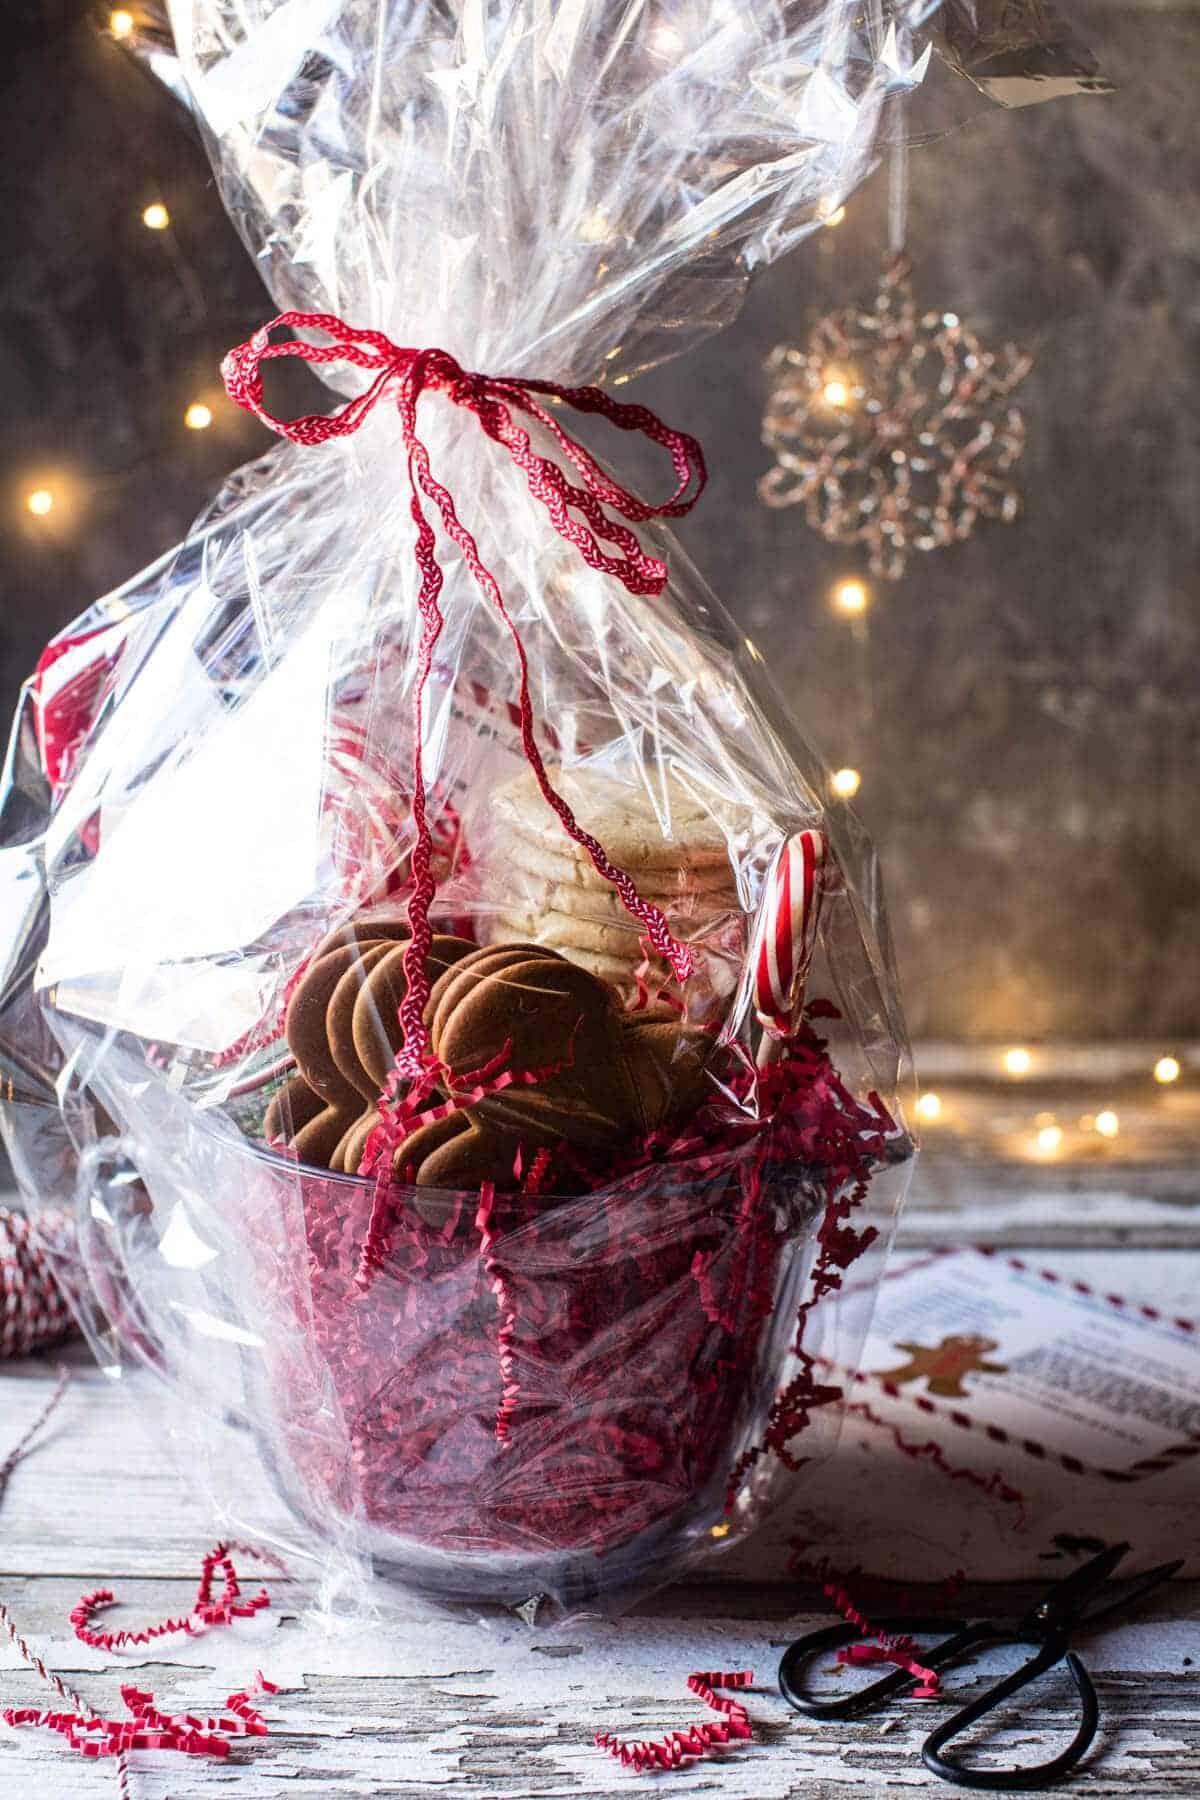 Christmas Cookie Decorating Kit | halfbakedharvest.com @hbharvest